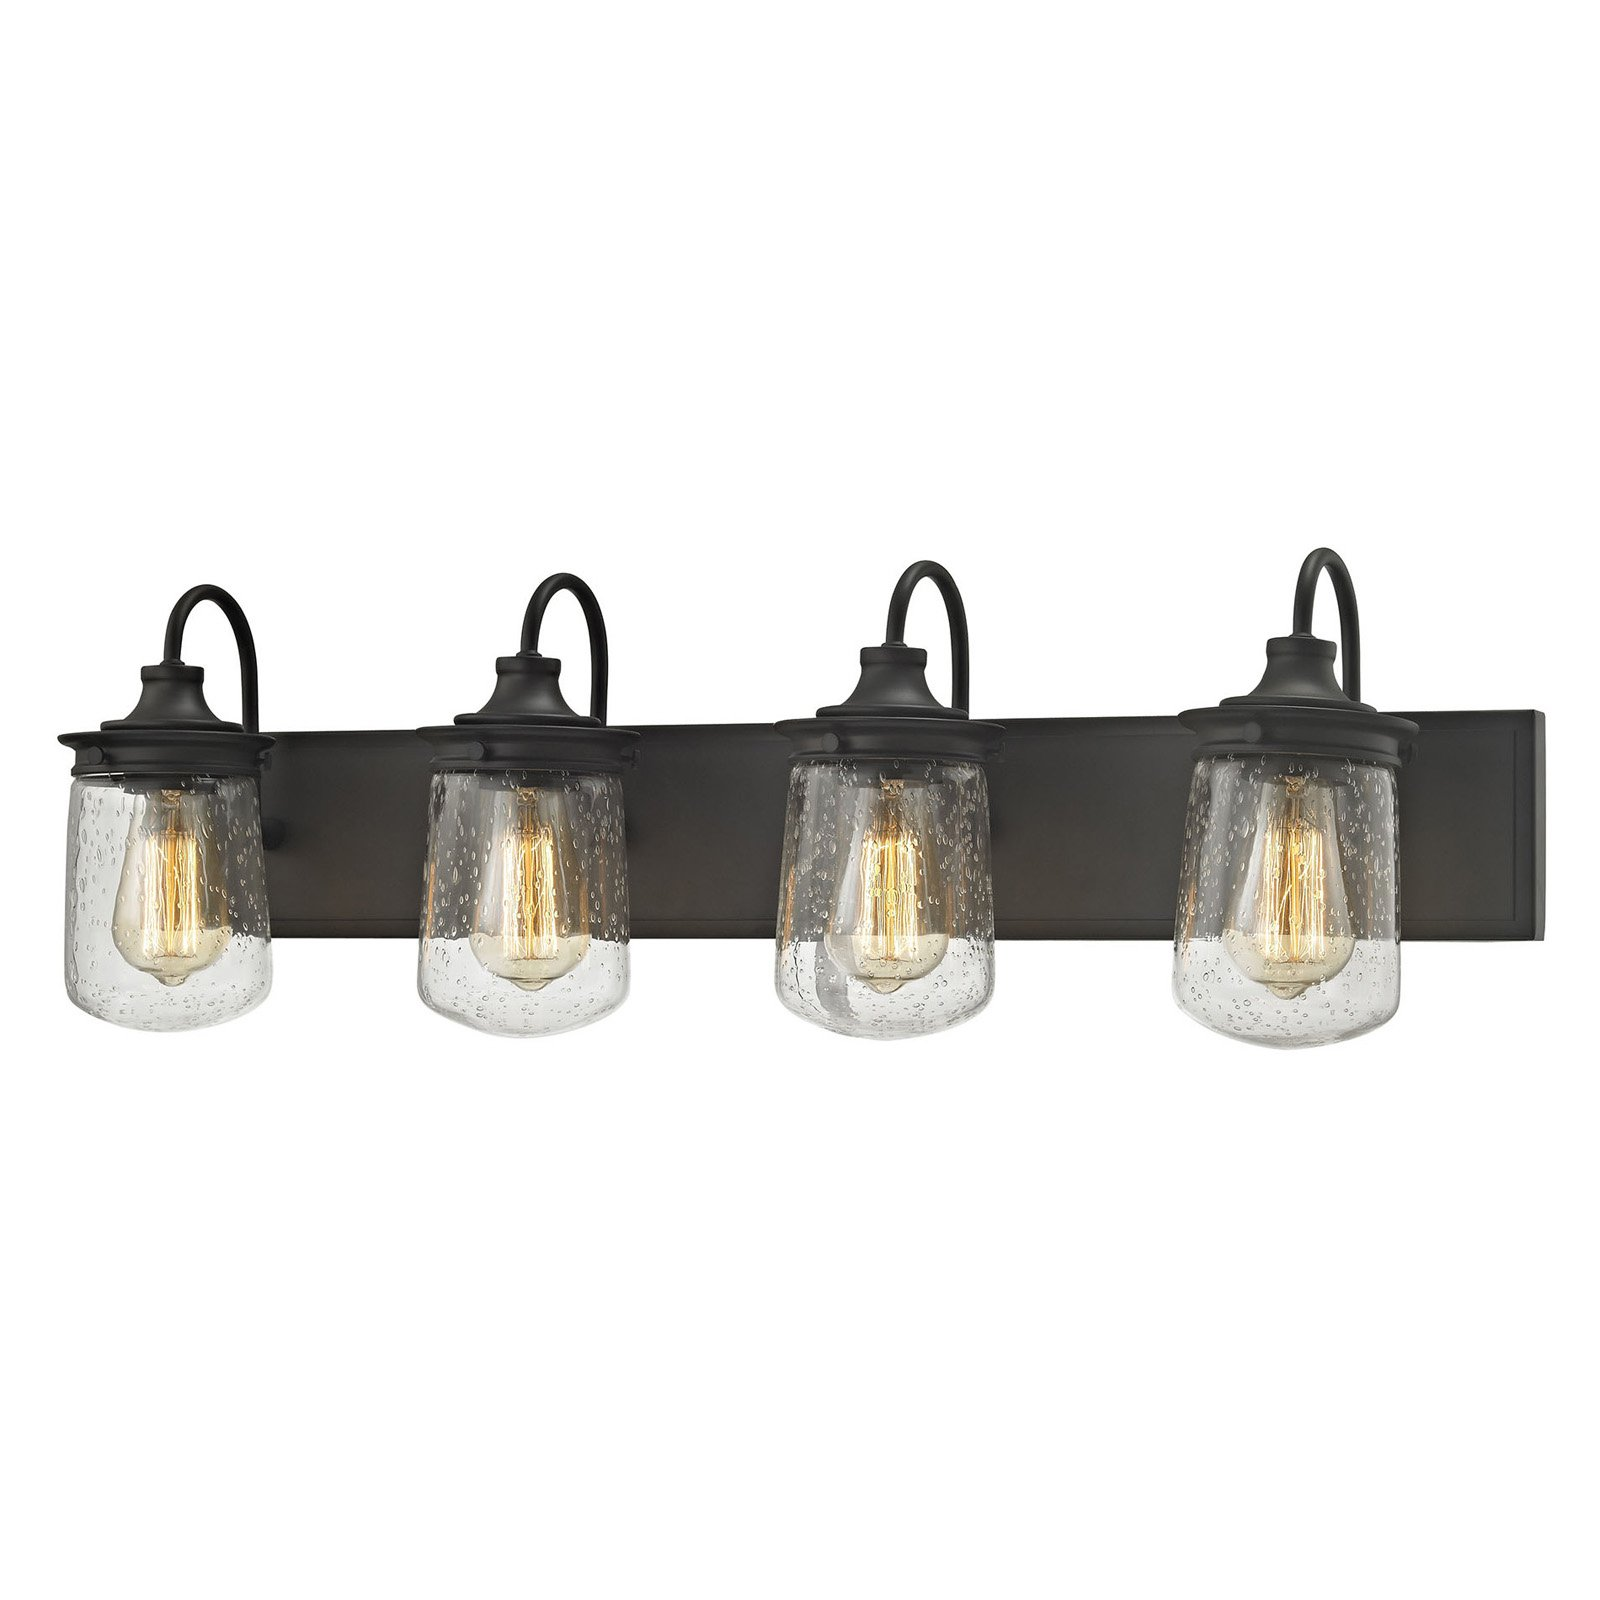 Elk lighting hamel 81213 4 bathroom vanity light